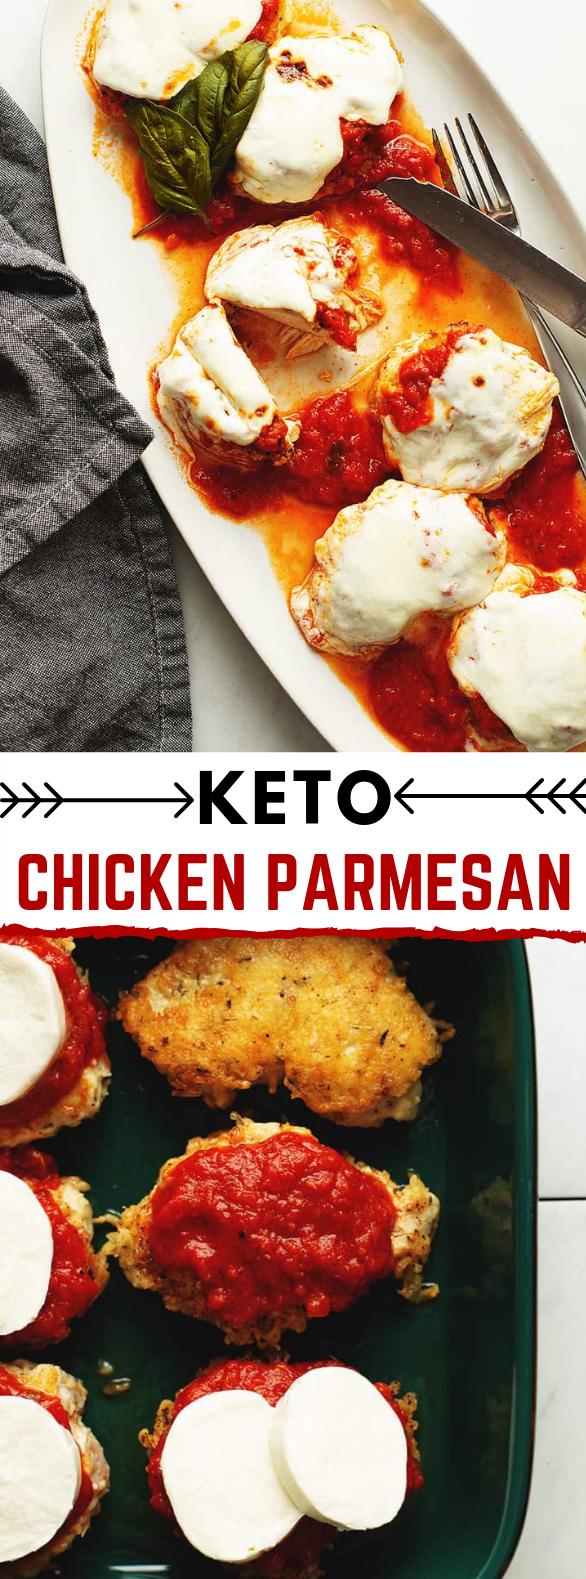 Keto Chicken Parmesan #ketorecipes #lowcarbrecipes